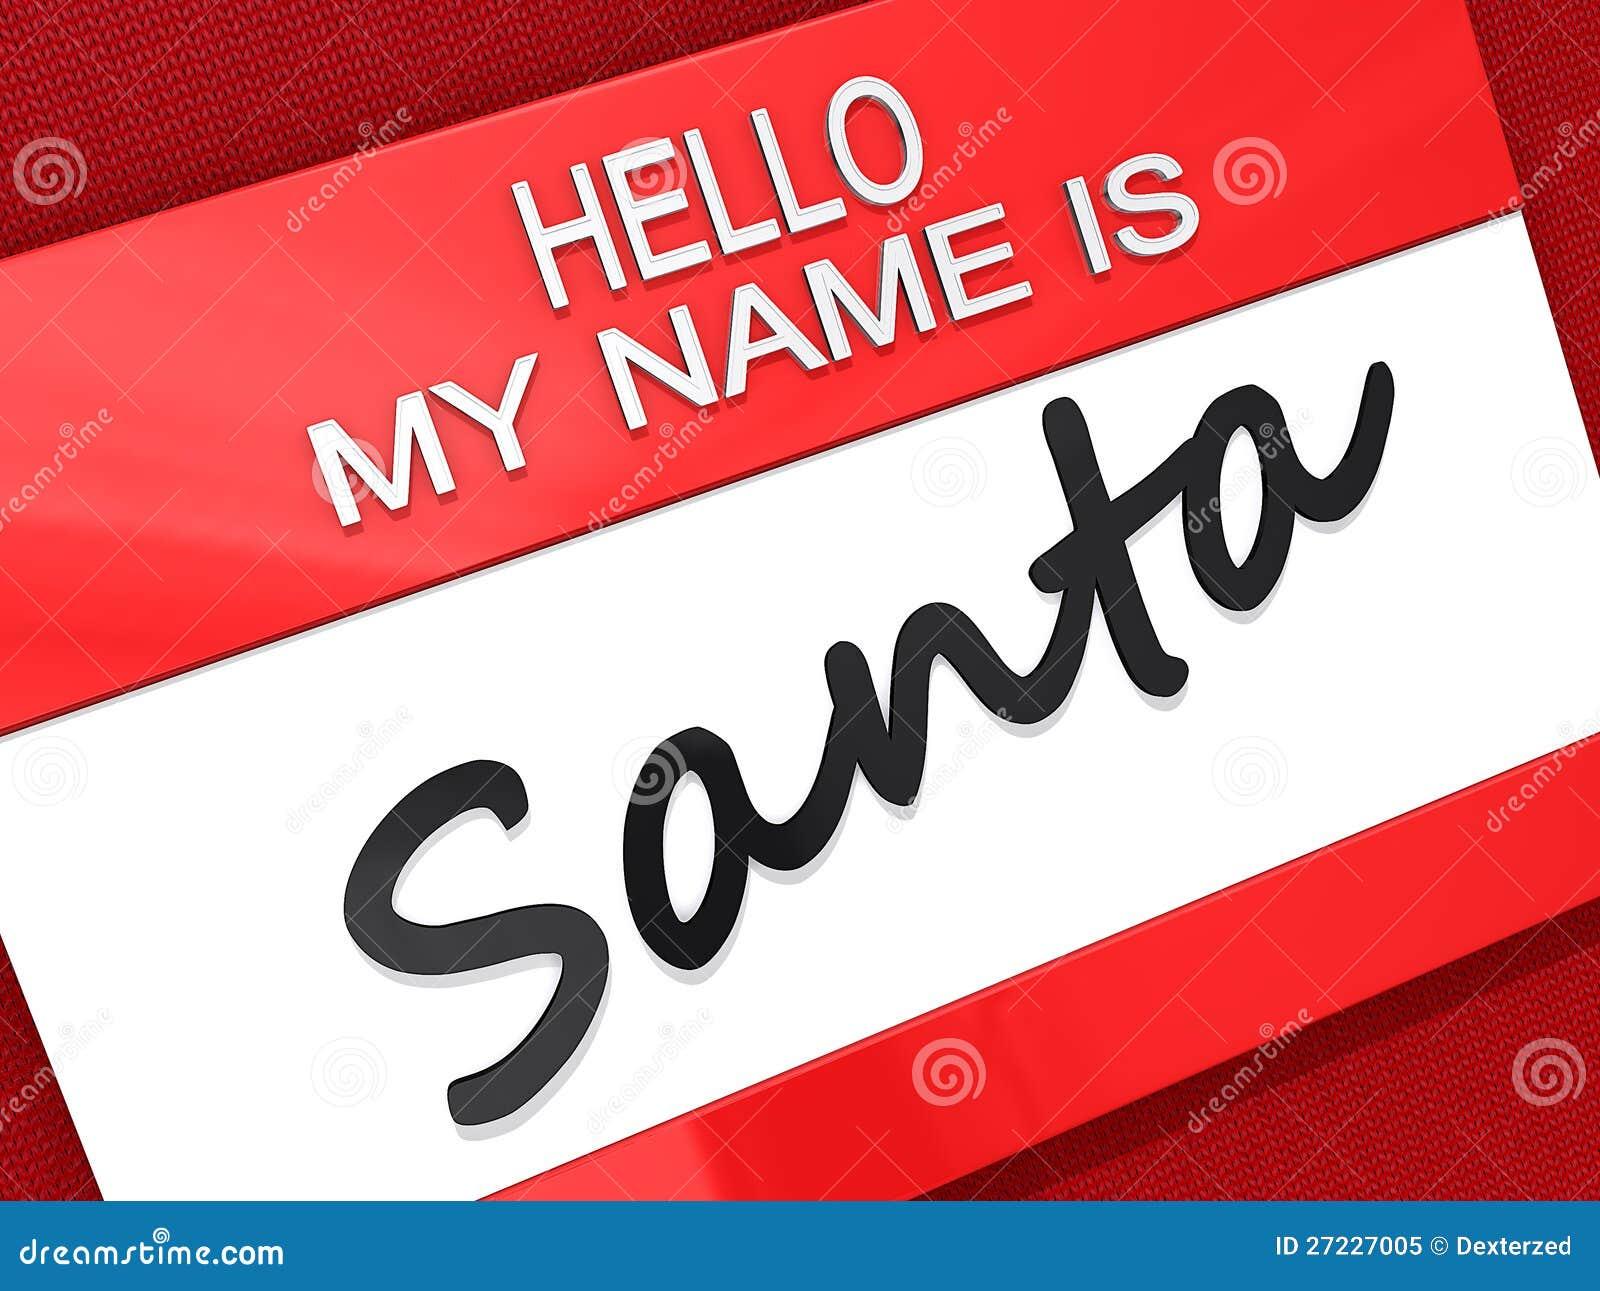 hello my name is santa sticker royalty free stock photo